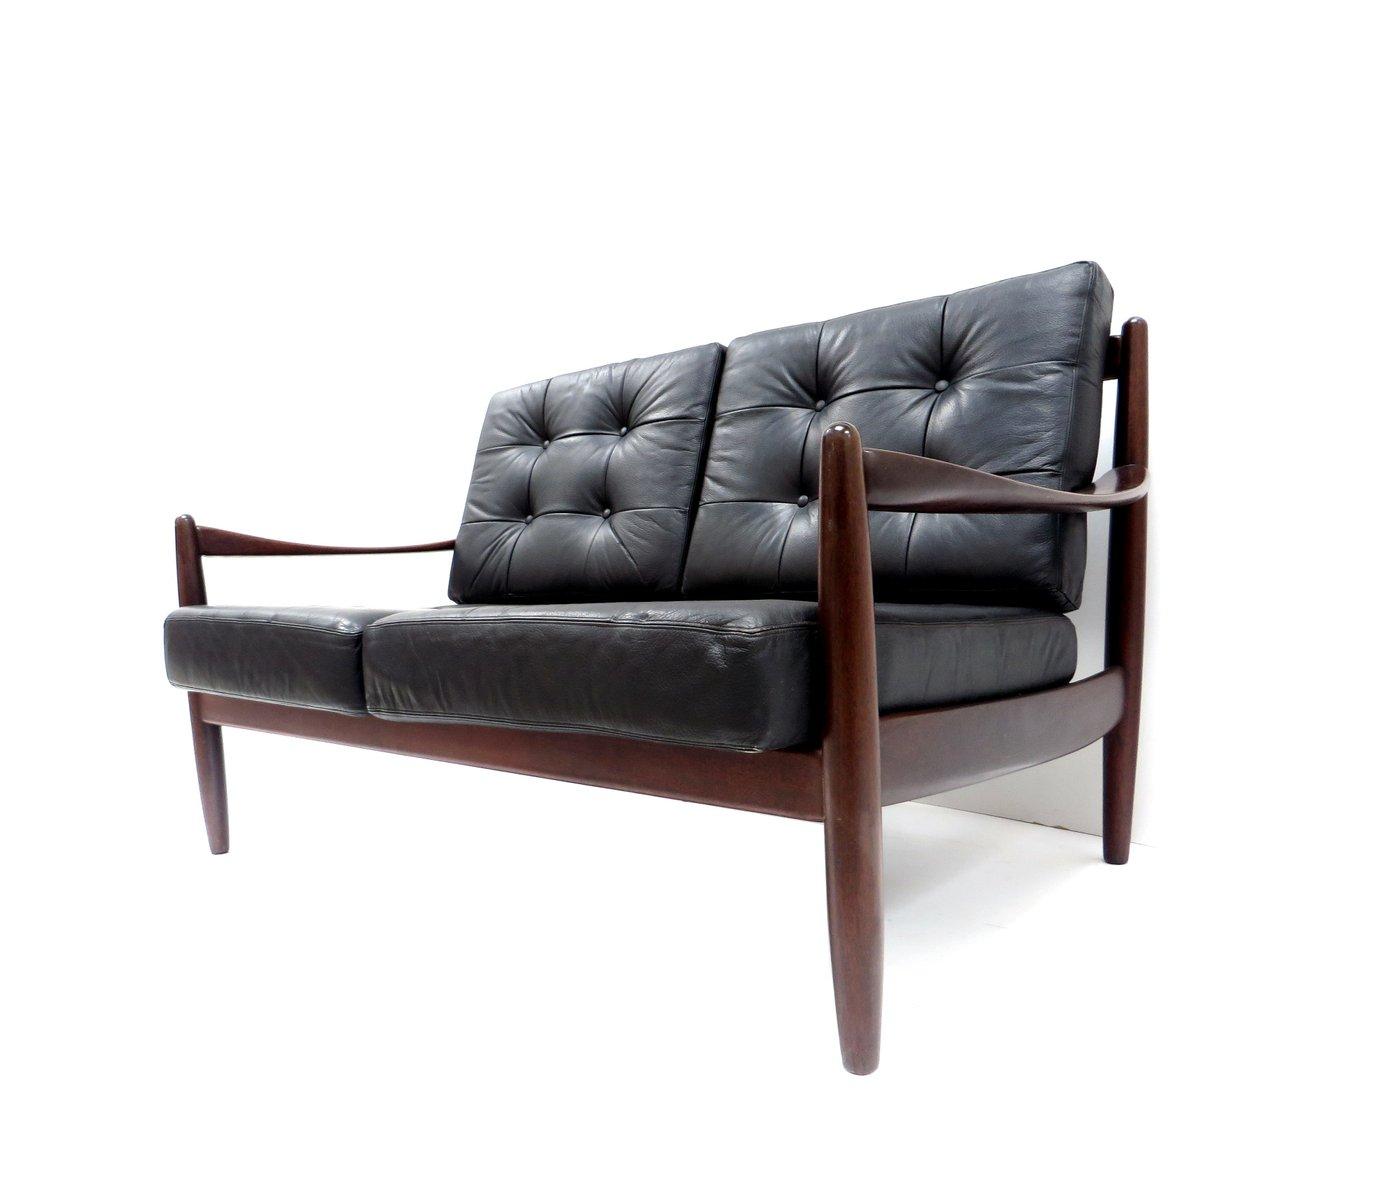 d nisches 2 sitzer ledersofa bei pamono kaufen. Black Bedroom Furniture Sets. Home Design Ideas